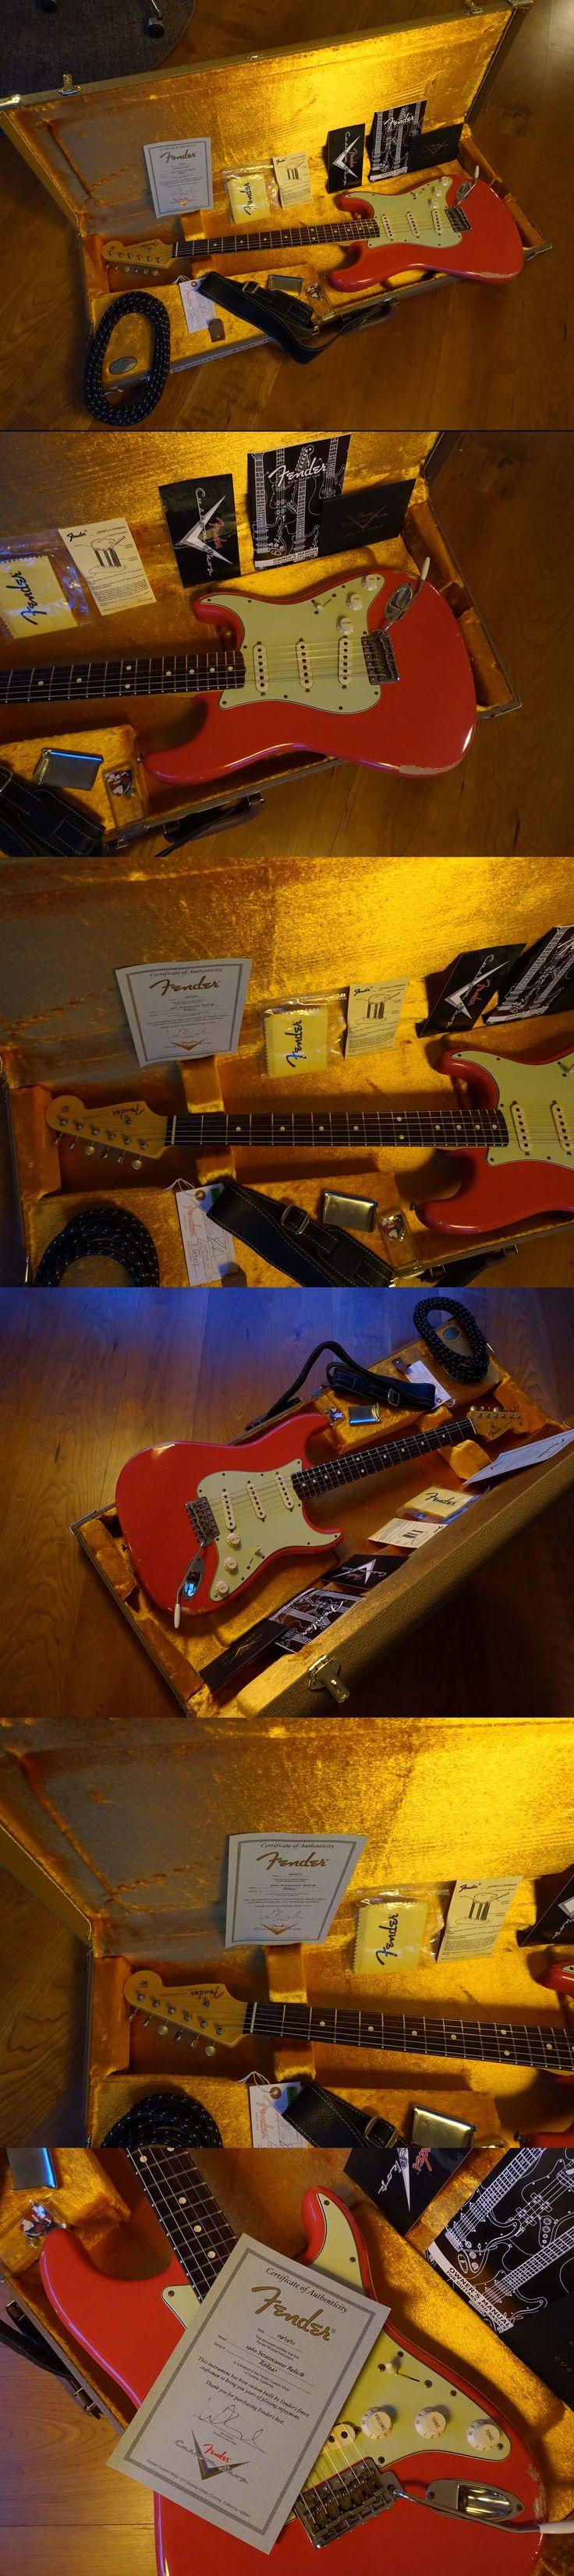 2012 Fender Custom Shop 1960 Relic Stratocaster, Fiesta Red (incl. Abigail Ybarra Pickups)